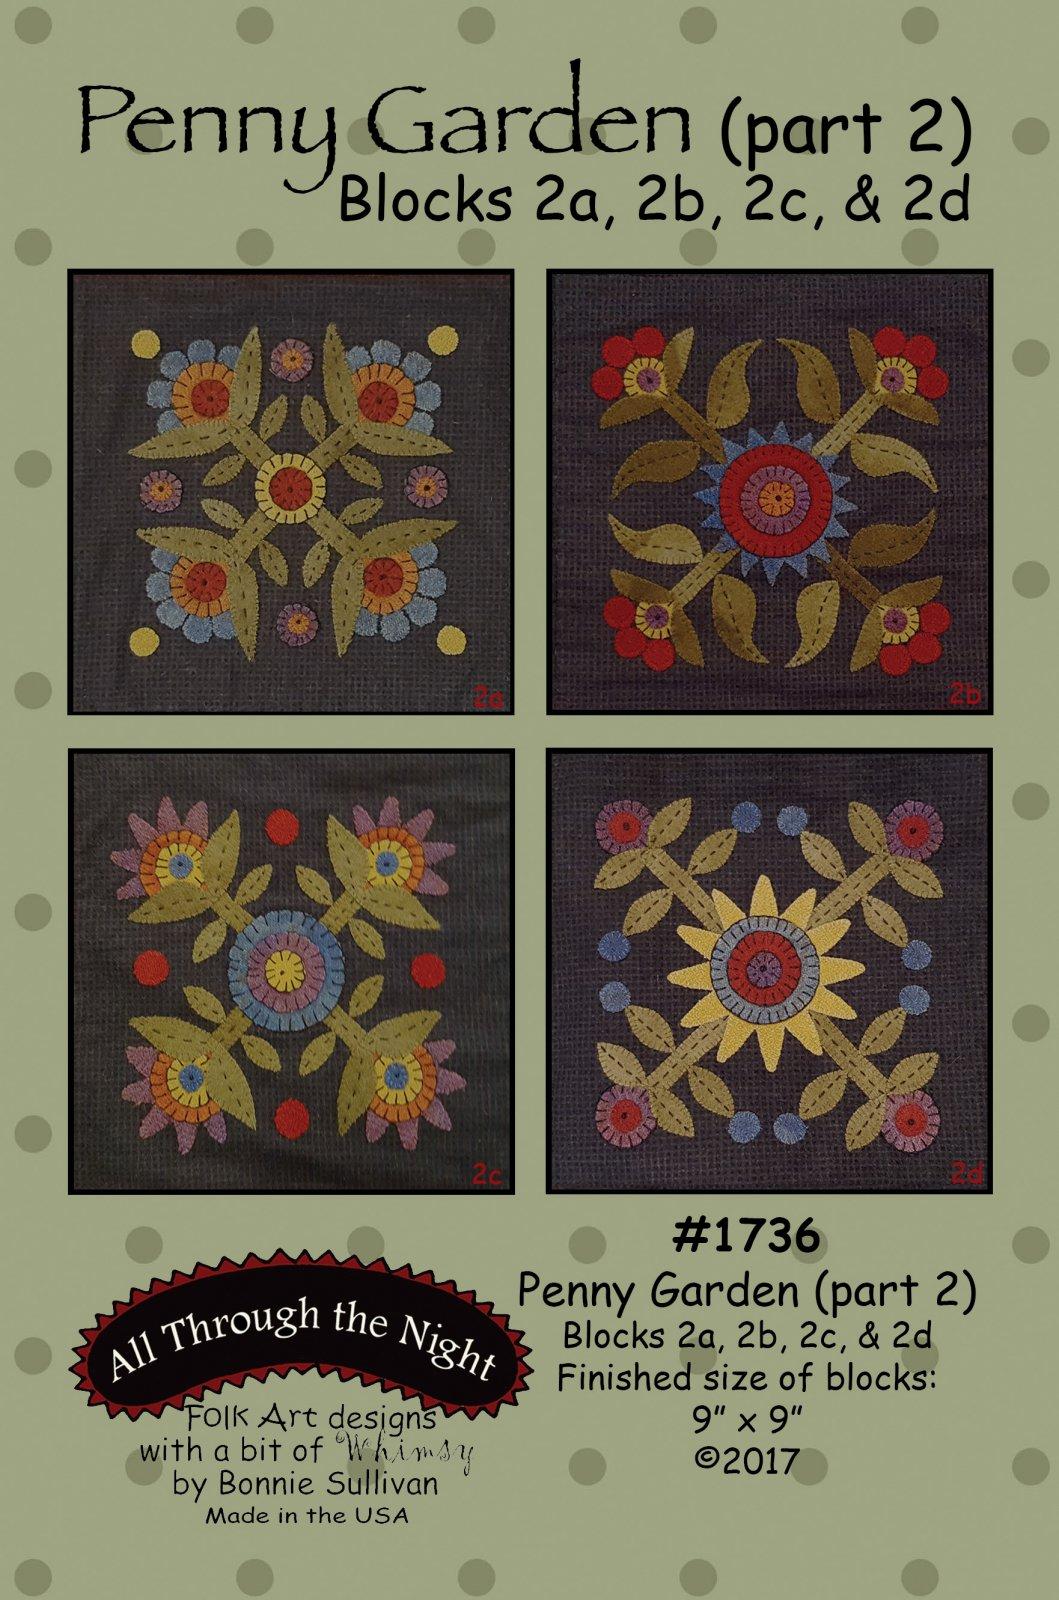 1736 Penny Garden (part 2)